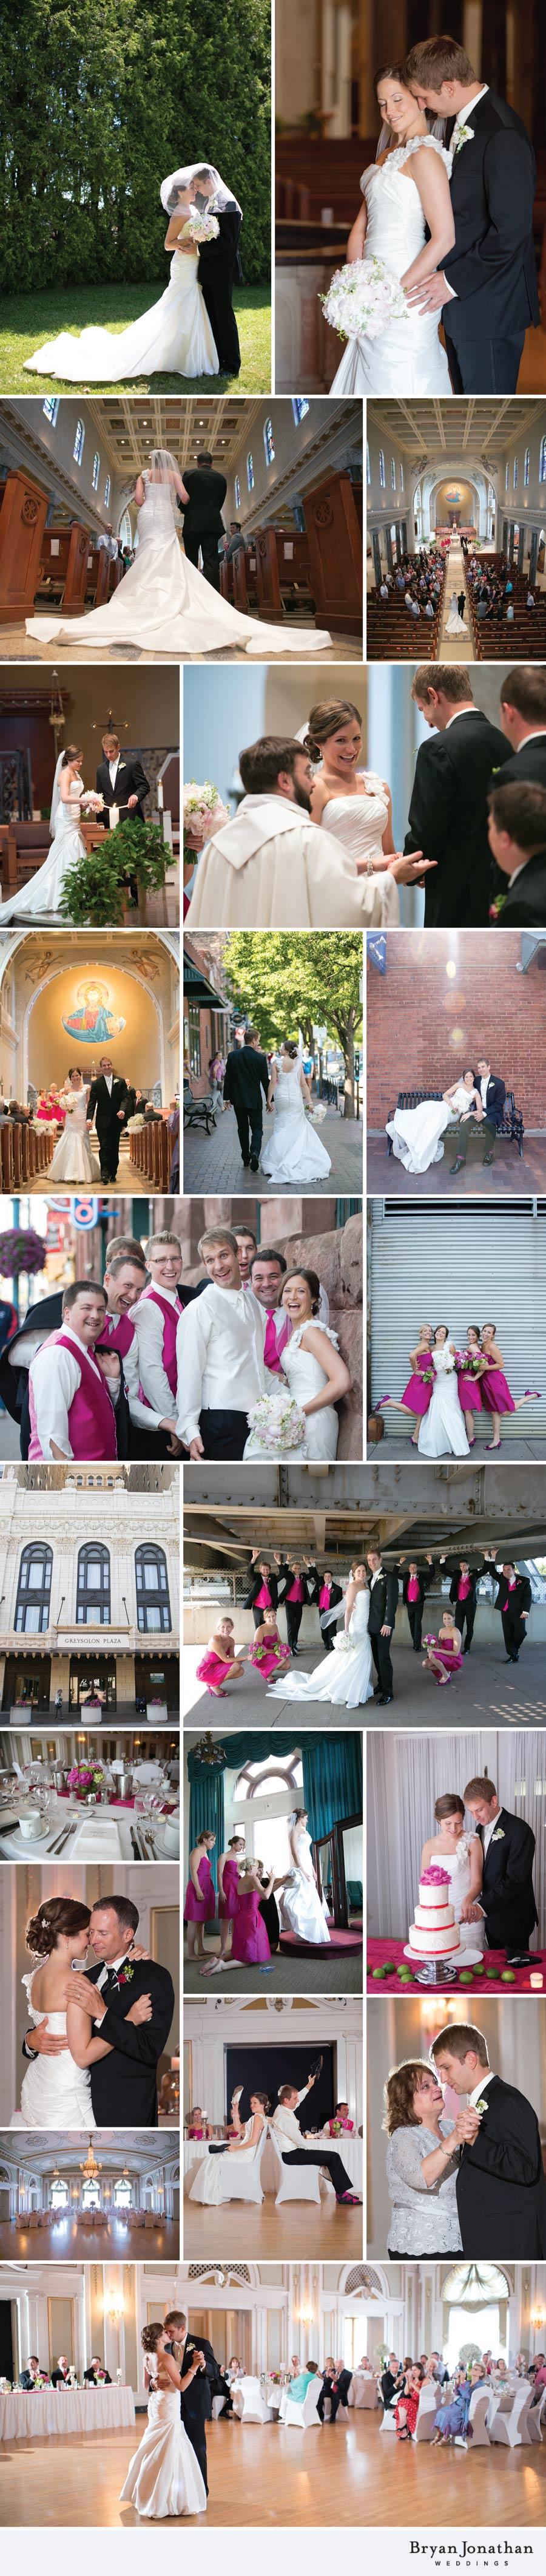 cathedral-of-christ-the-king-superior-wi-wedding-greysolon-ballroom-bryan-jonathan-weddings2